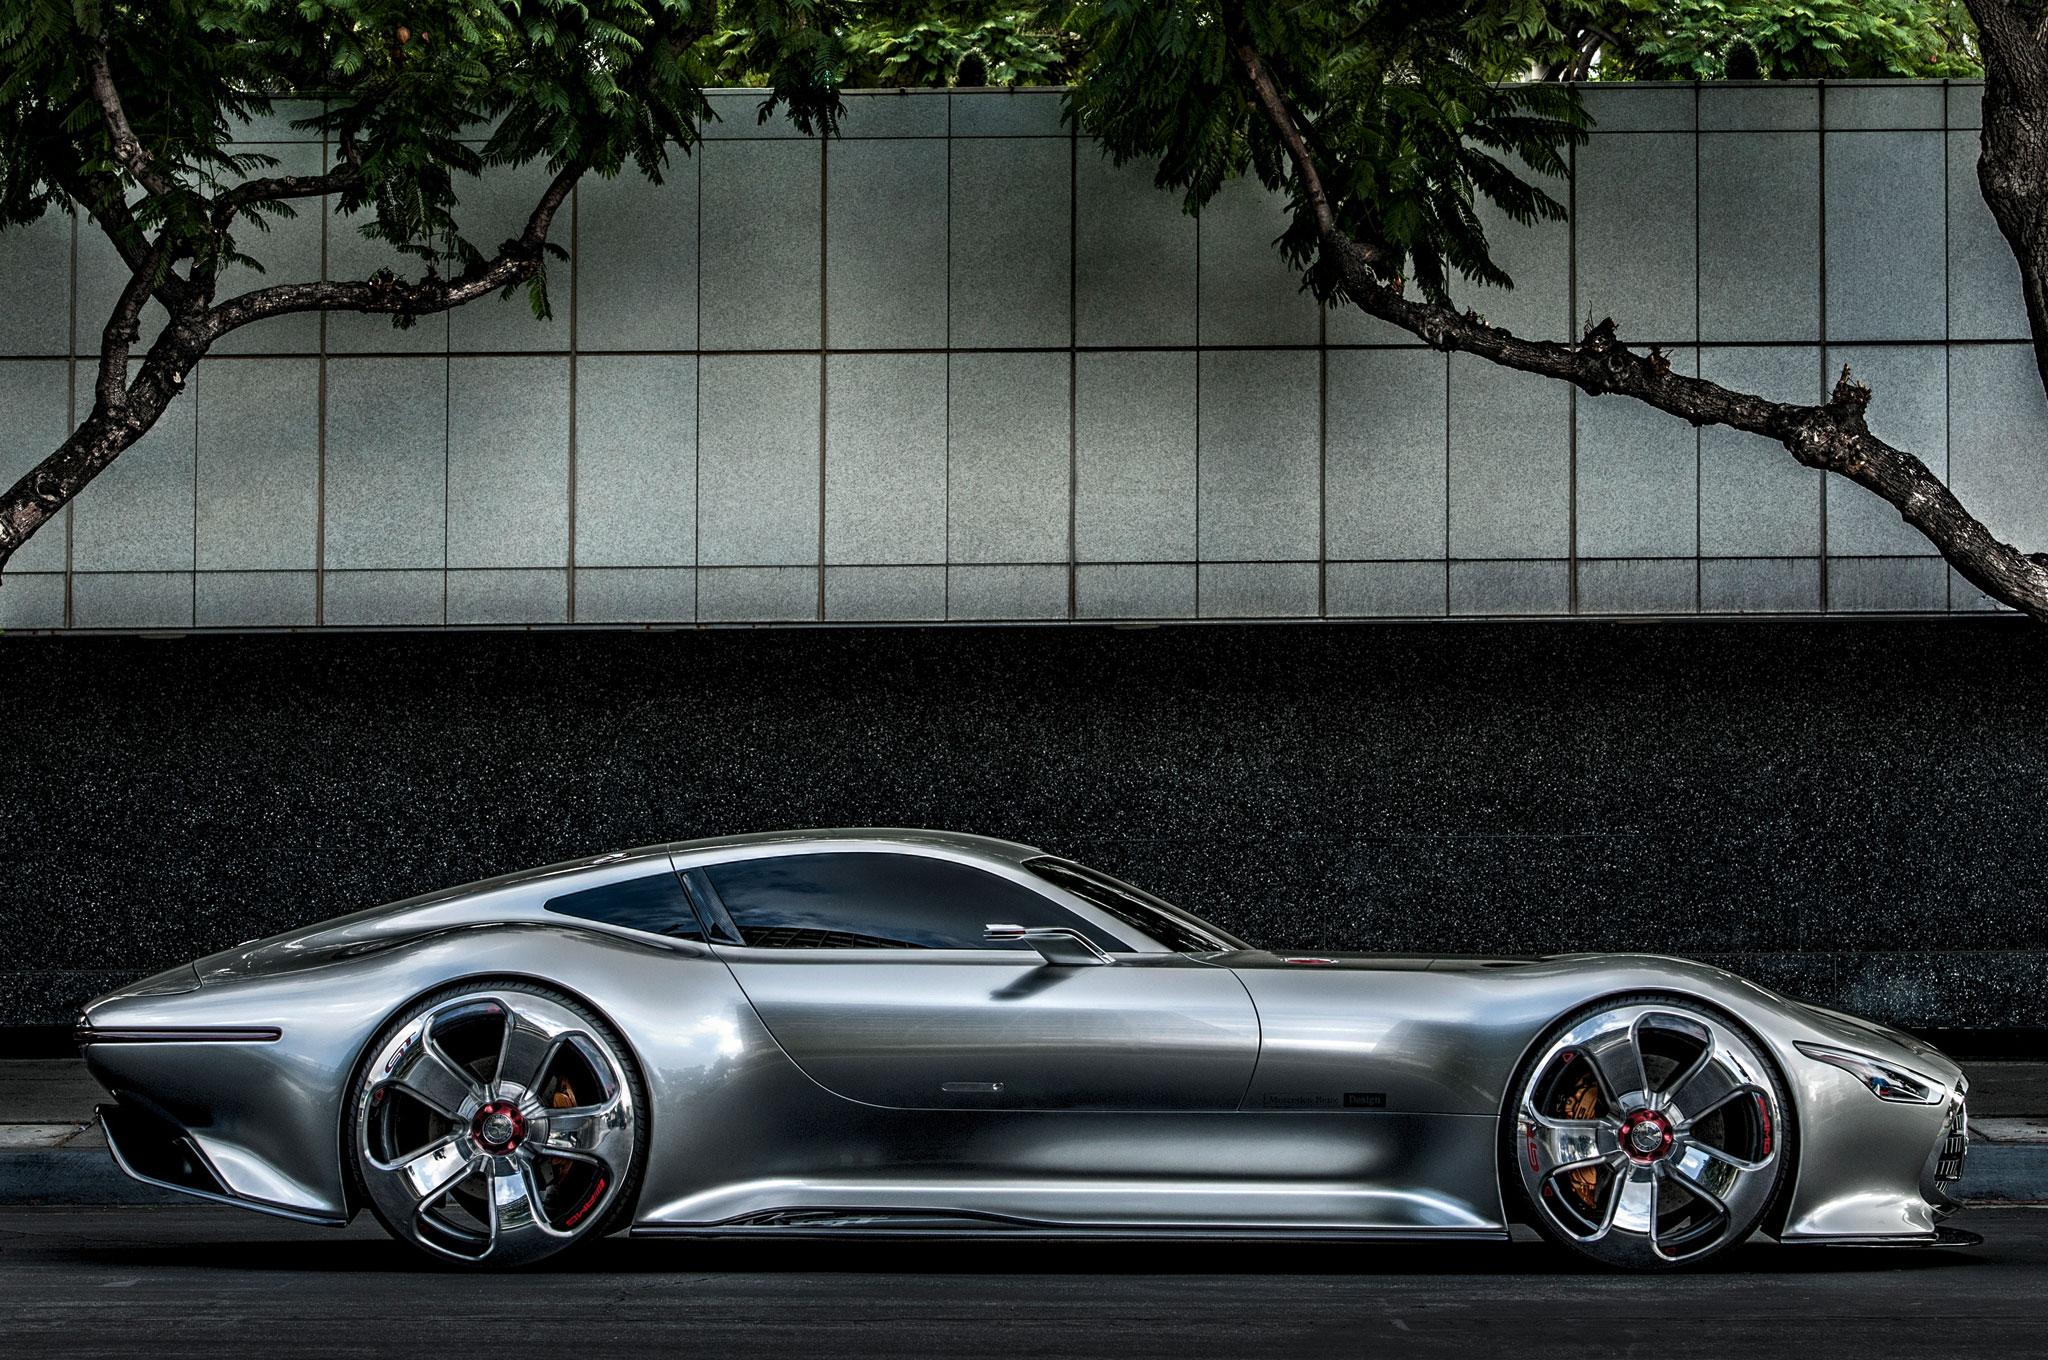 Mercedes Benz AMG Vision Gran Turismo Concept 2048x1360